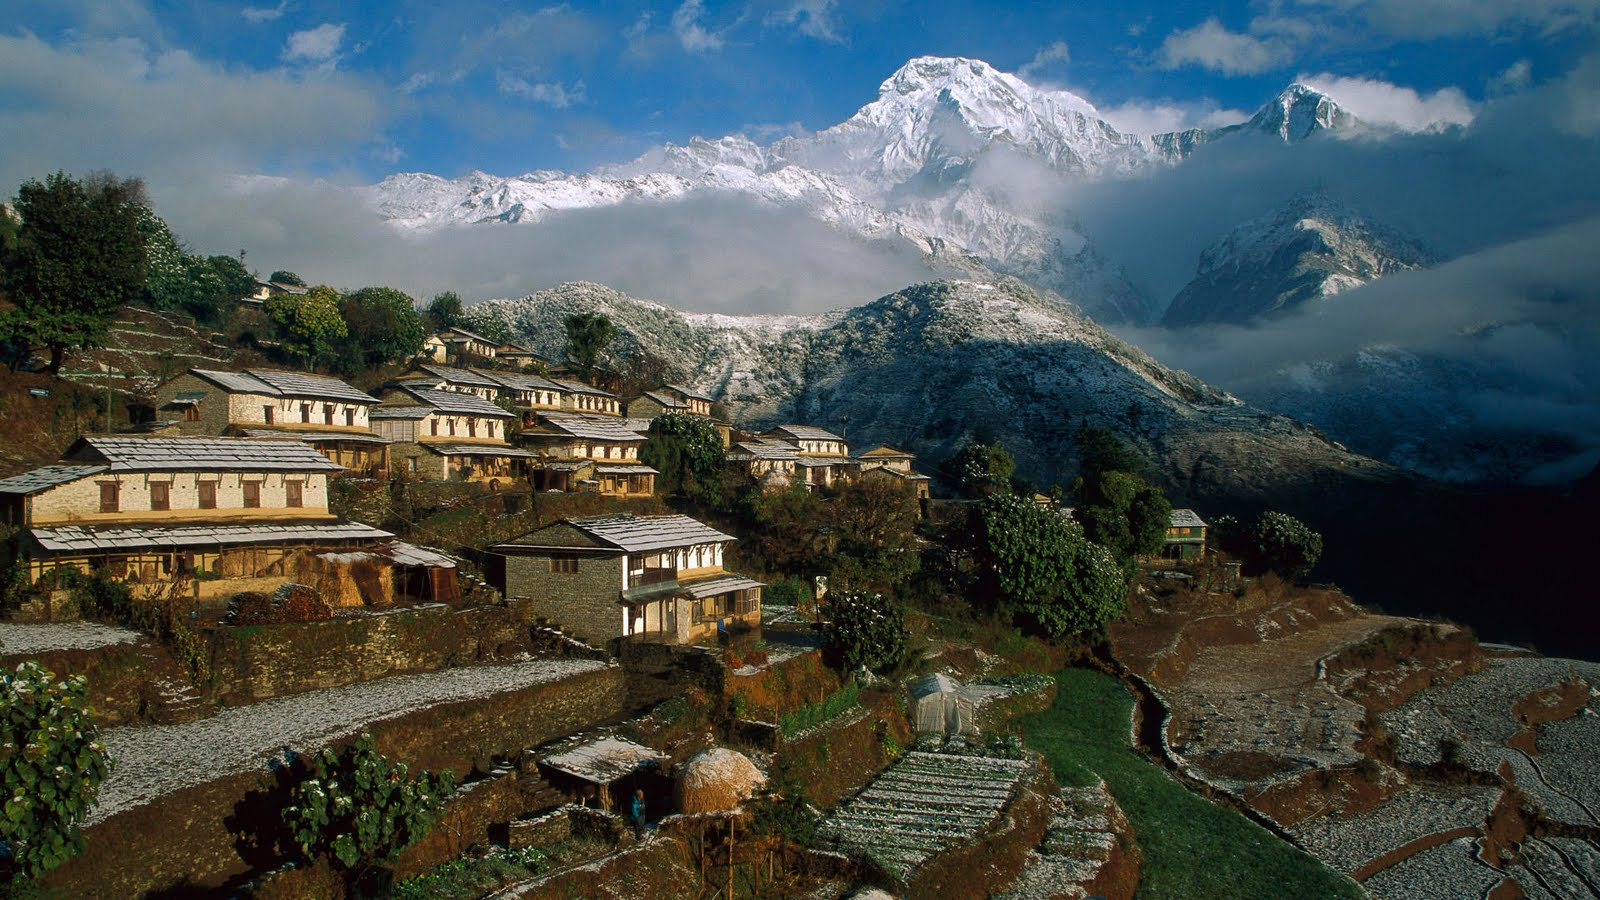 ghangdrung-village-annapurna-sodha-travel